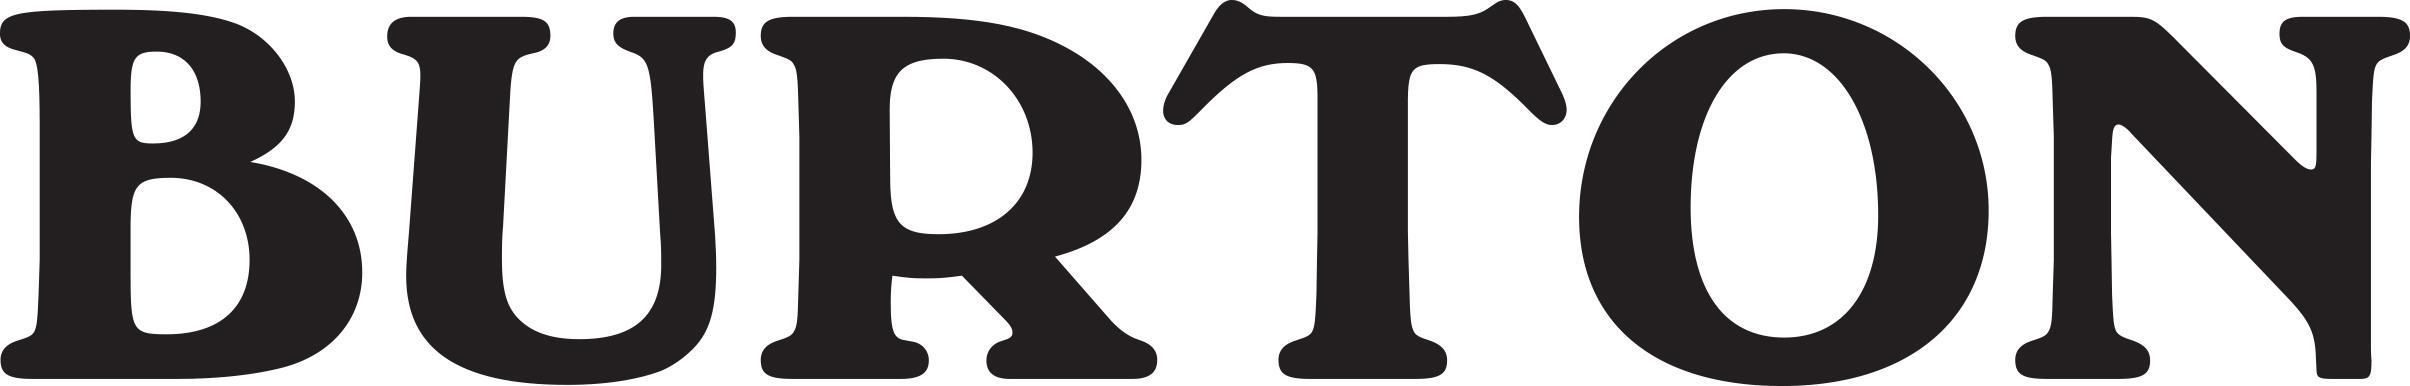 Burton-W19_primary-logo.jpg